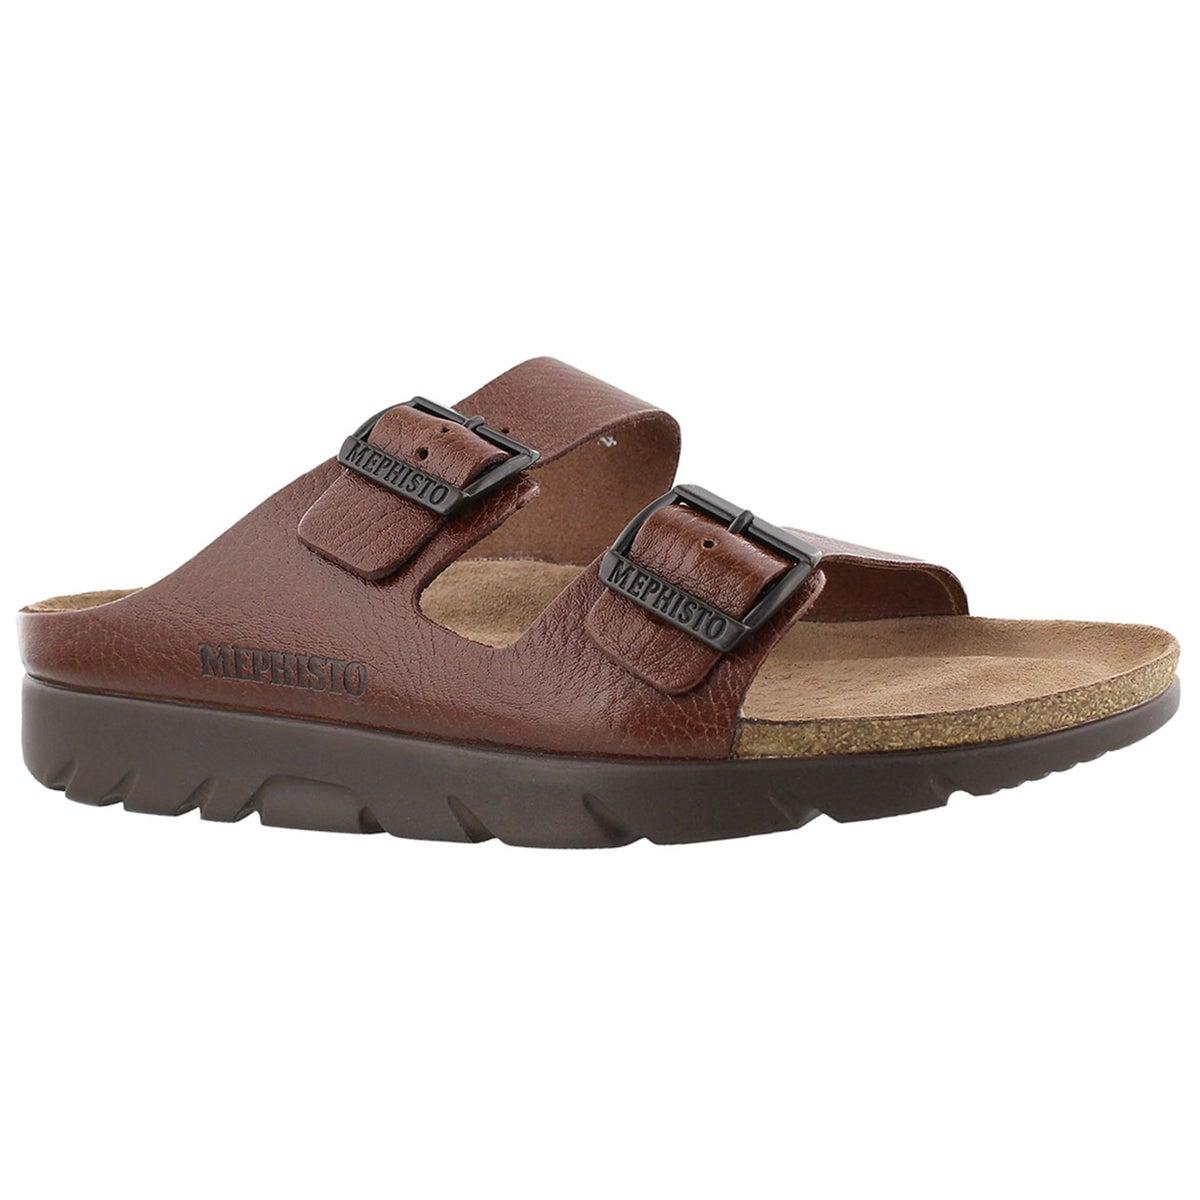 Men's ZONDER tan cork footbed sandals